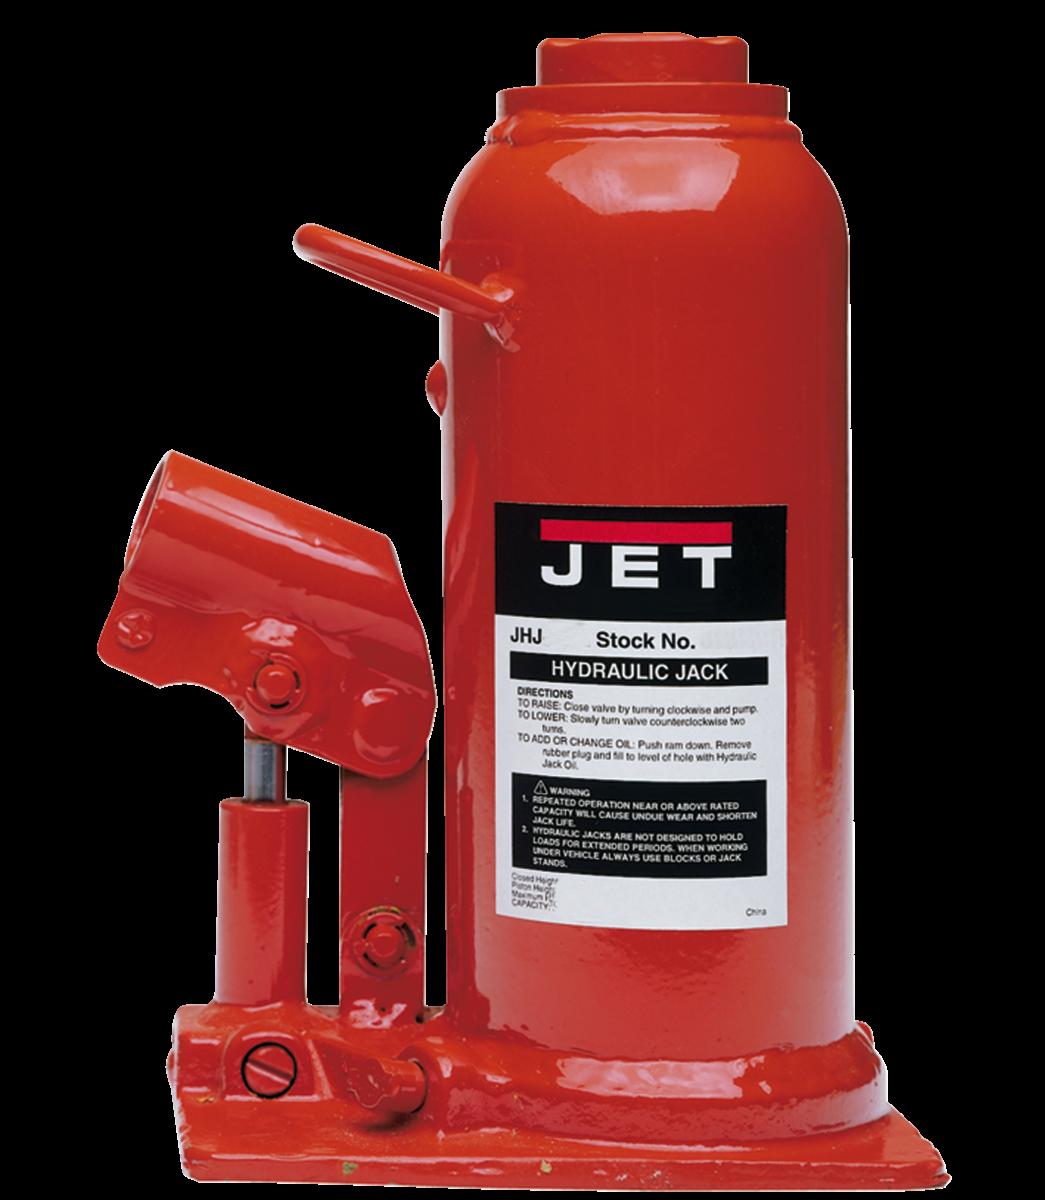 JHJ-8, 8-Ton Hydraulic Bottle Jack